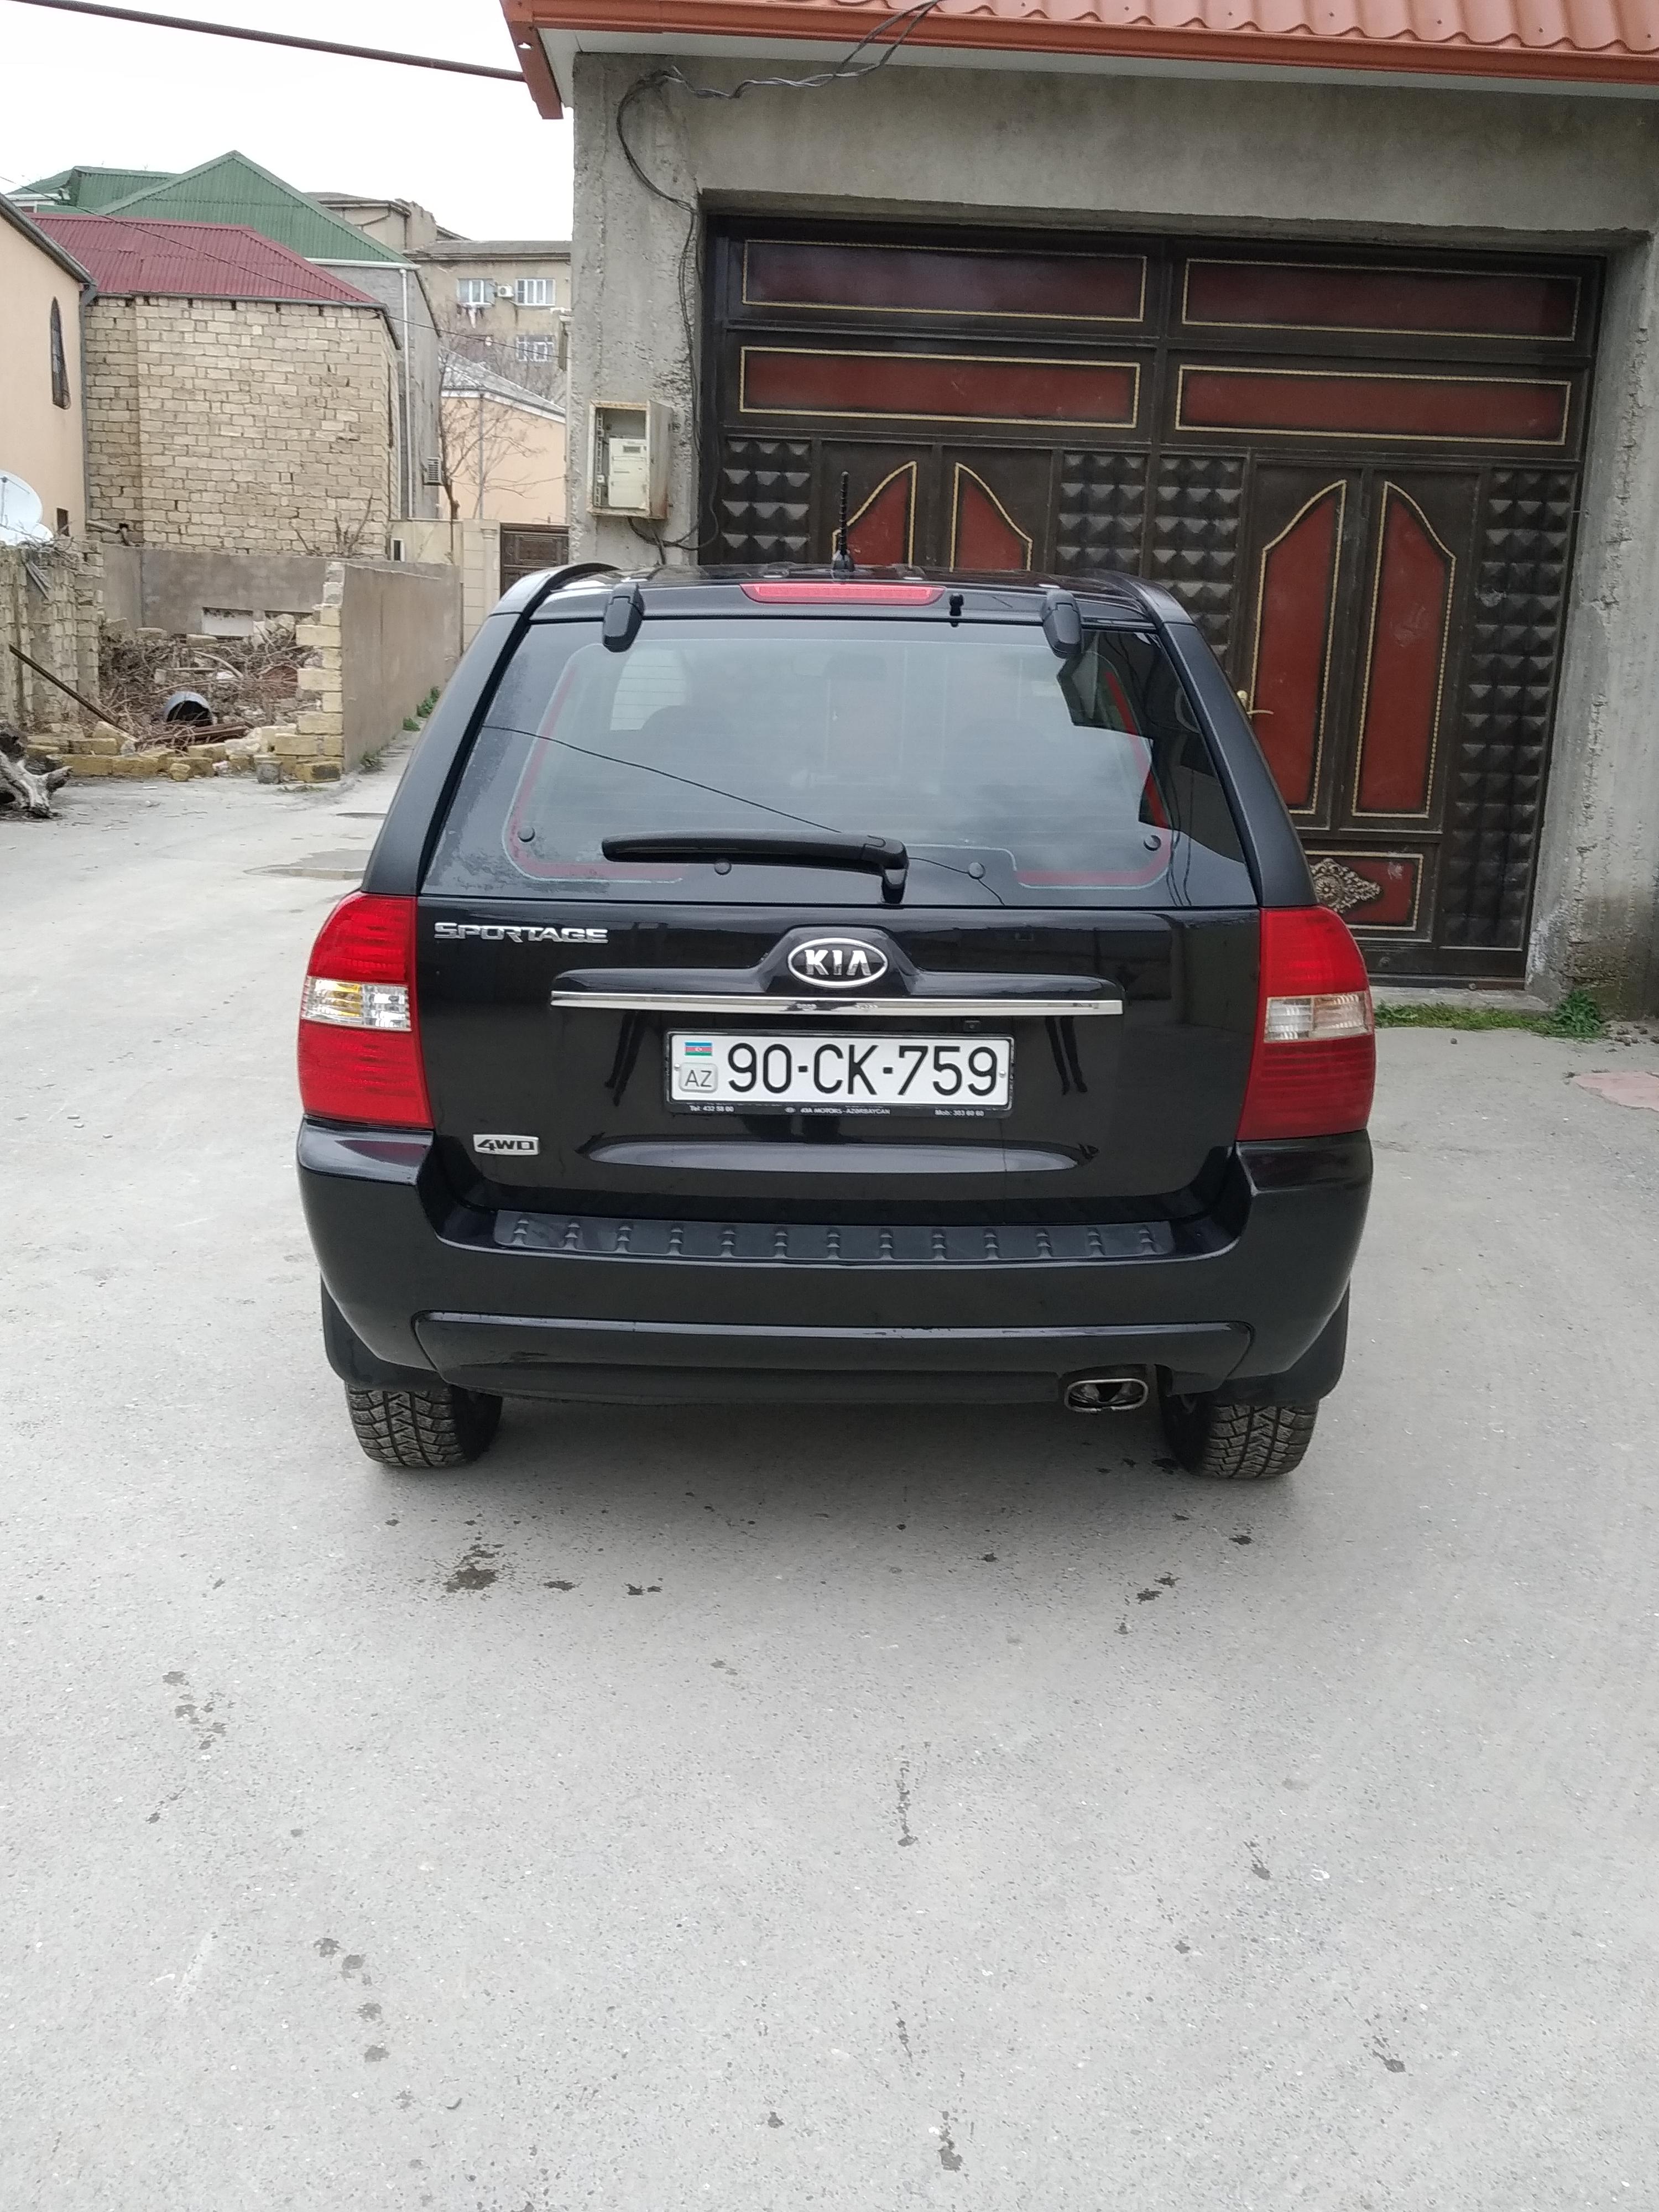 Kia Sportage 2.0(lt) 2008 Подержанный  $15300